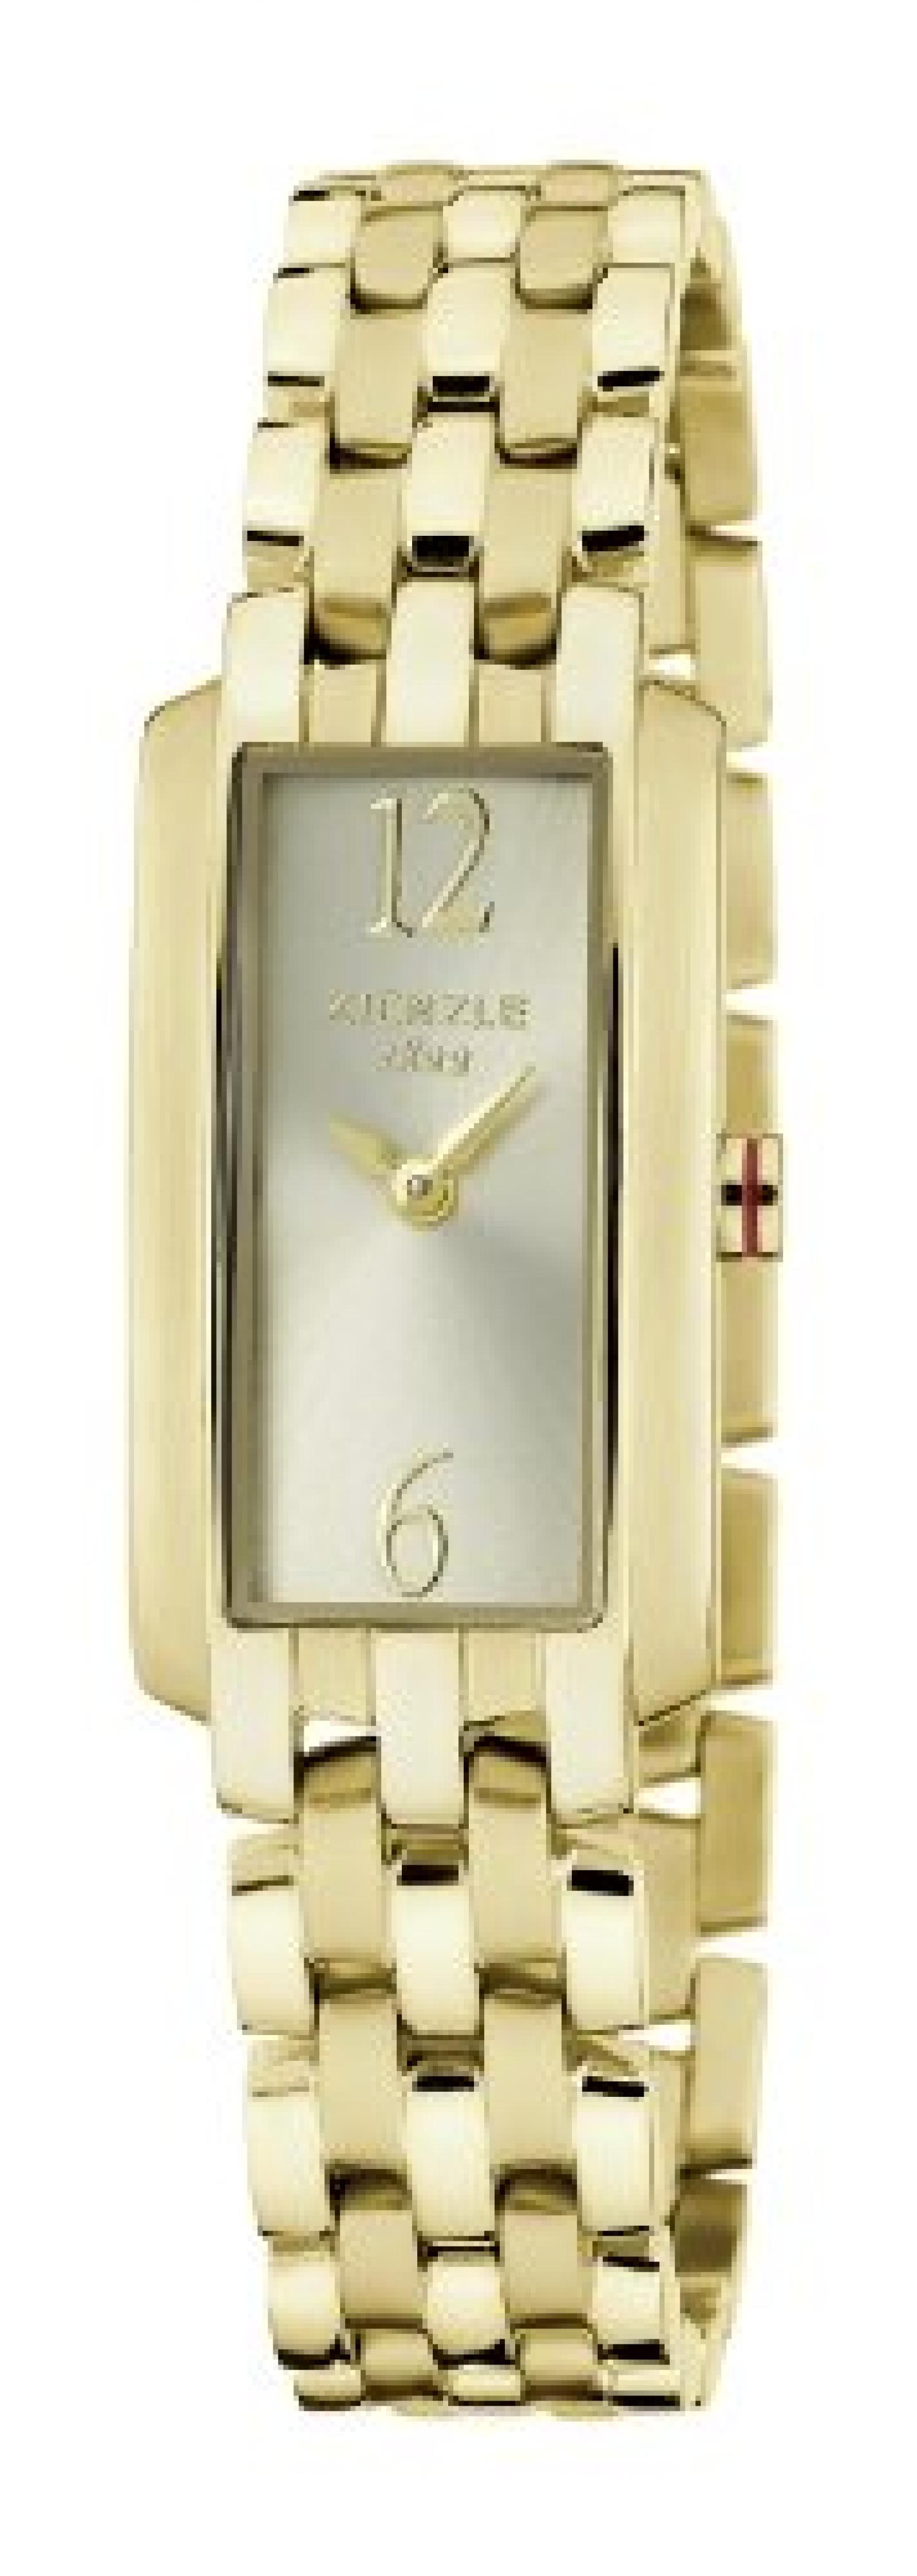 Kienzle Damen-Armbanduhr KIENZLE LADY Analog Quarz Edelstahl beschichtet K5092029042-00329